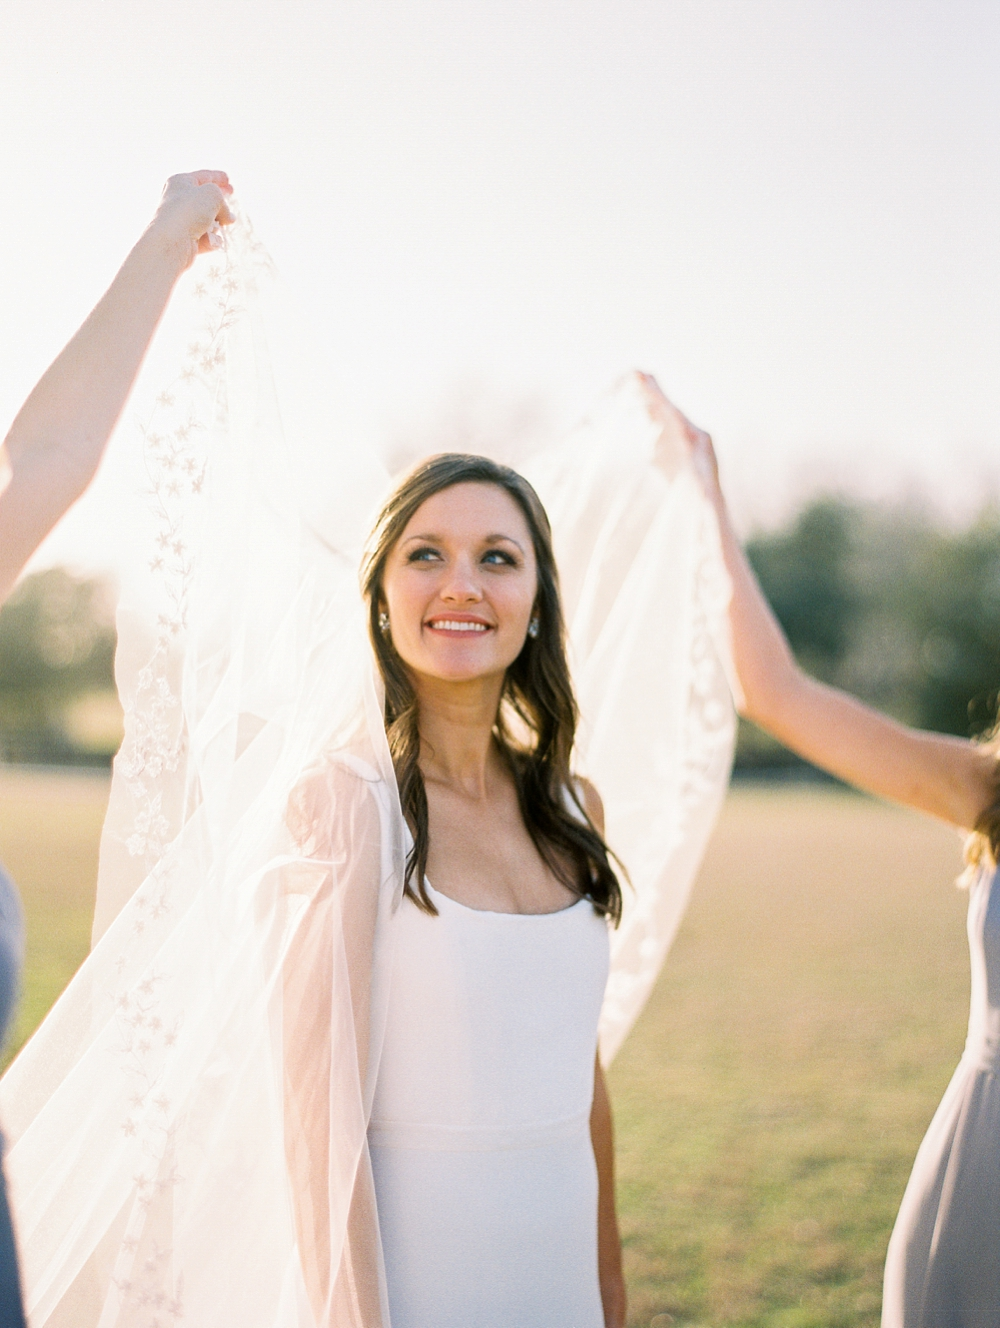 Kristin-La-Voie-Photography-austin-houston-texas-wedding-photographer-the-oaks-at-high-hill -25